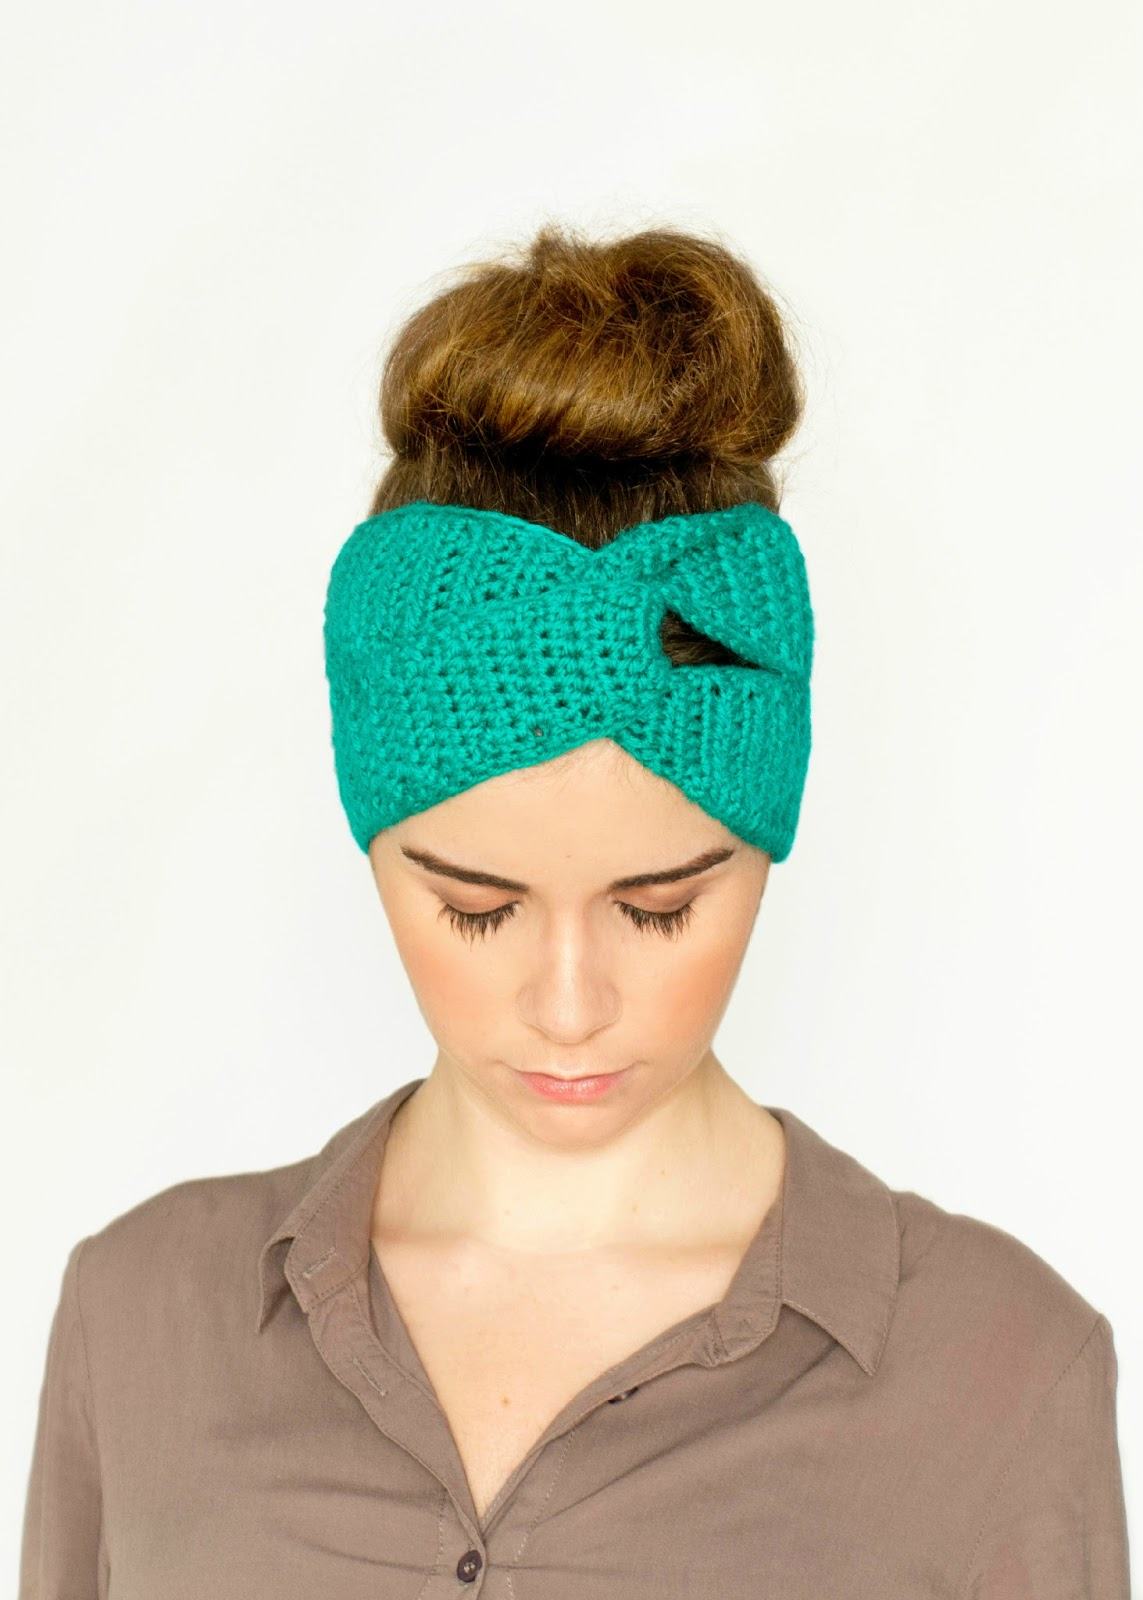 Twisted Turban Headband Interweave